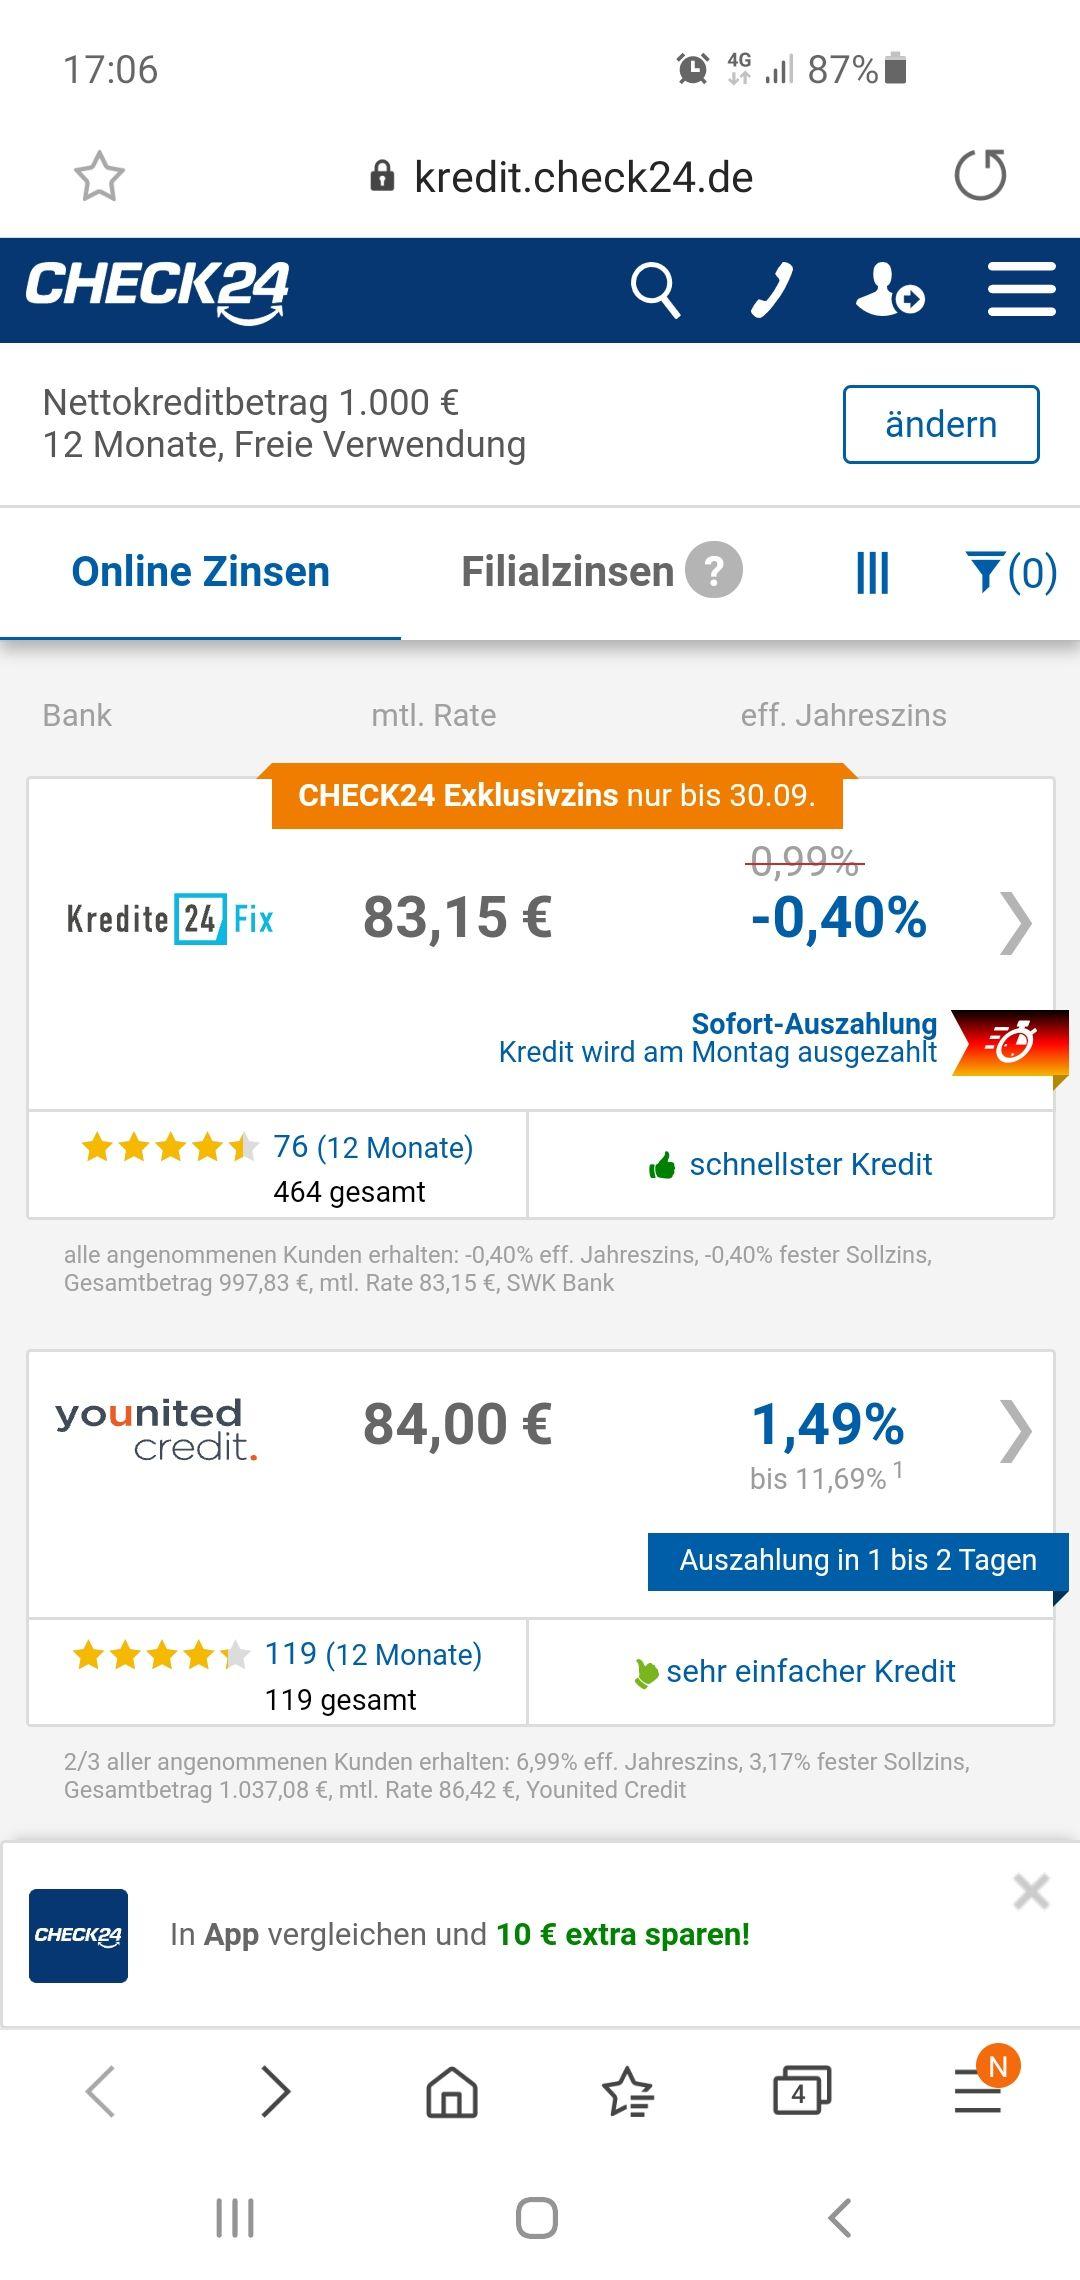 Kredit mit 0,4 % Negativzins Check 24/Kredit24fix